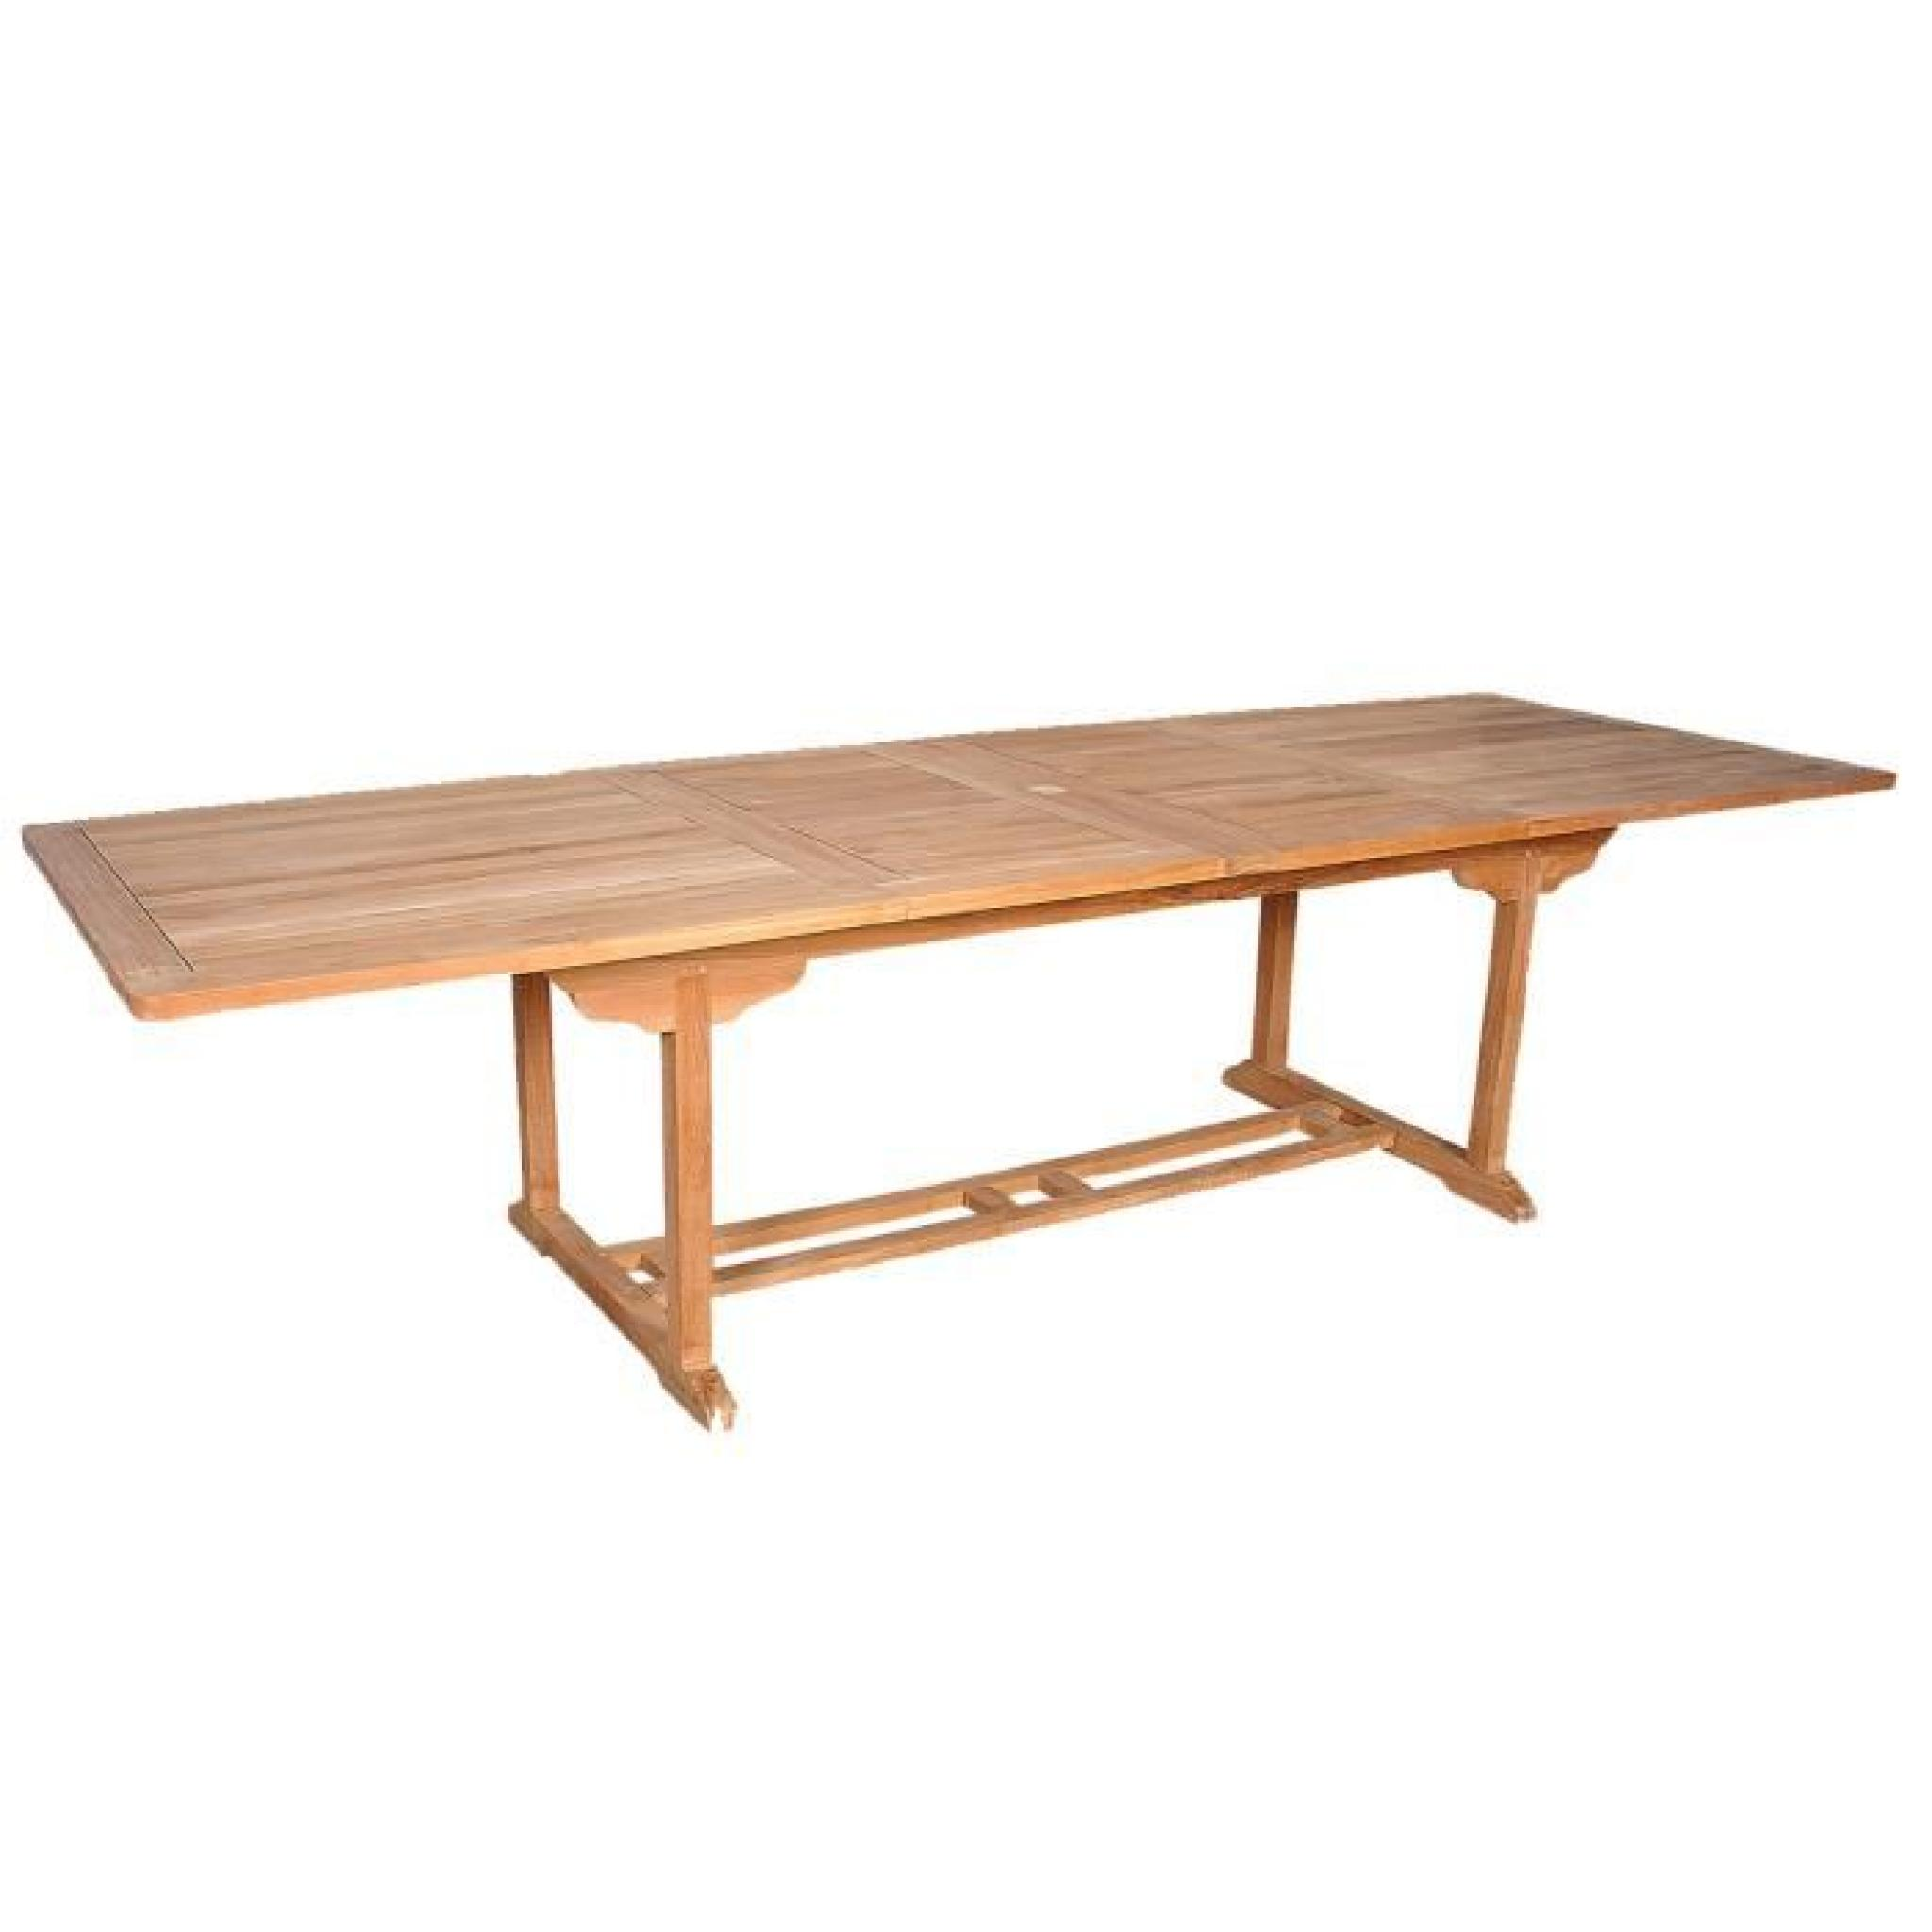 Salon de jardin en TECK BRUT QUALITE GRADE A 10/12 pers - Table ...